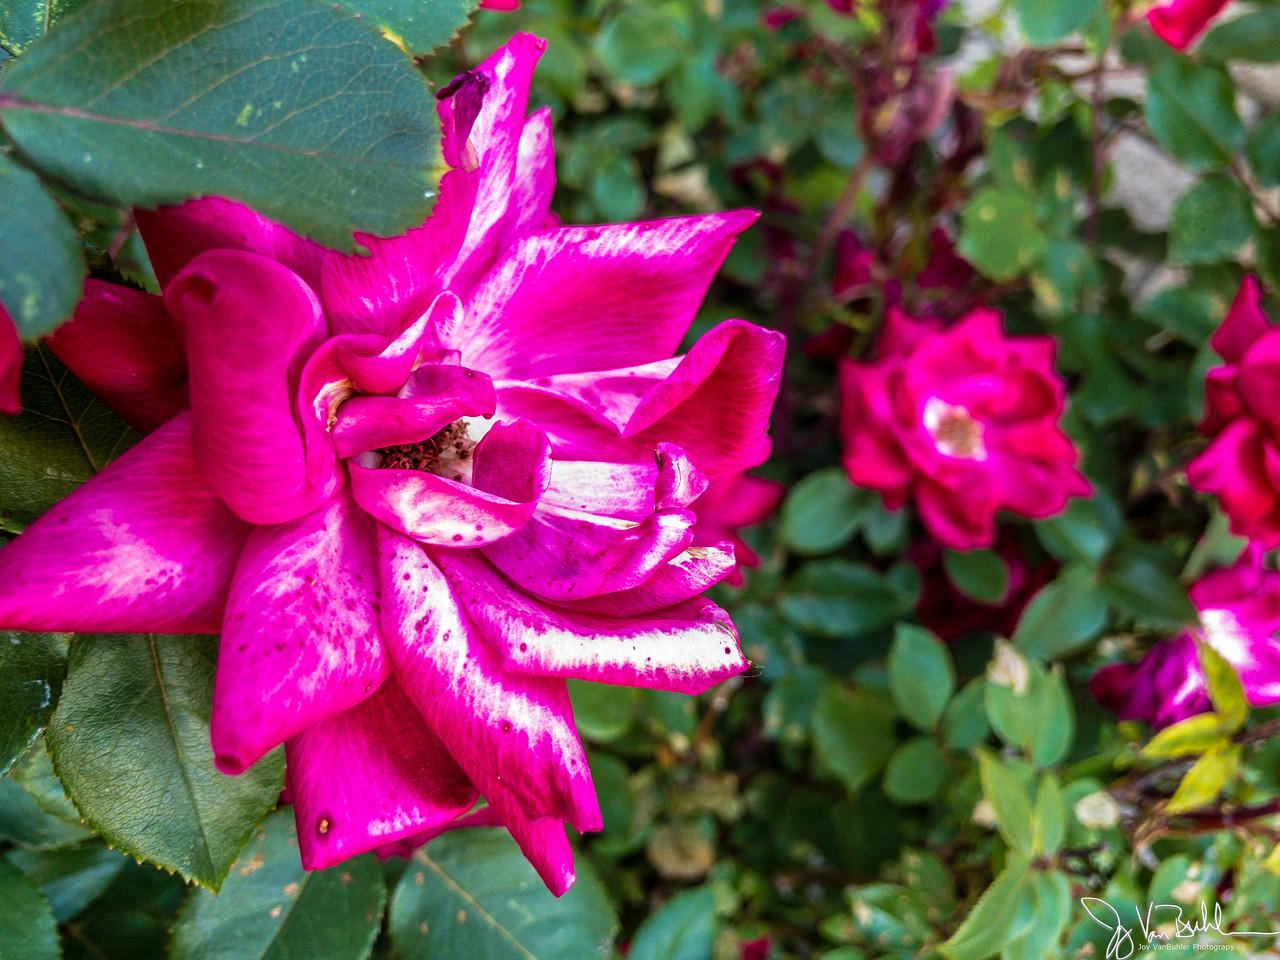 156/365 - Roses